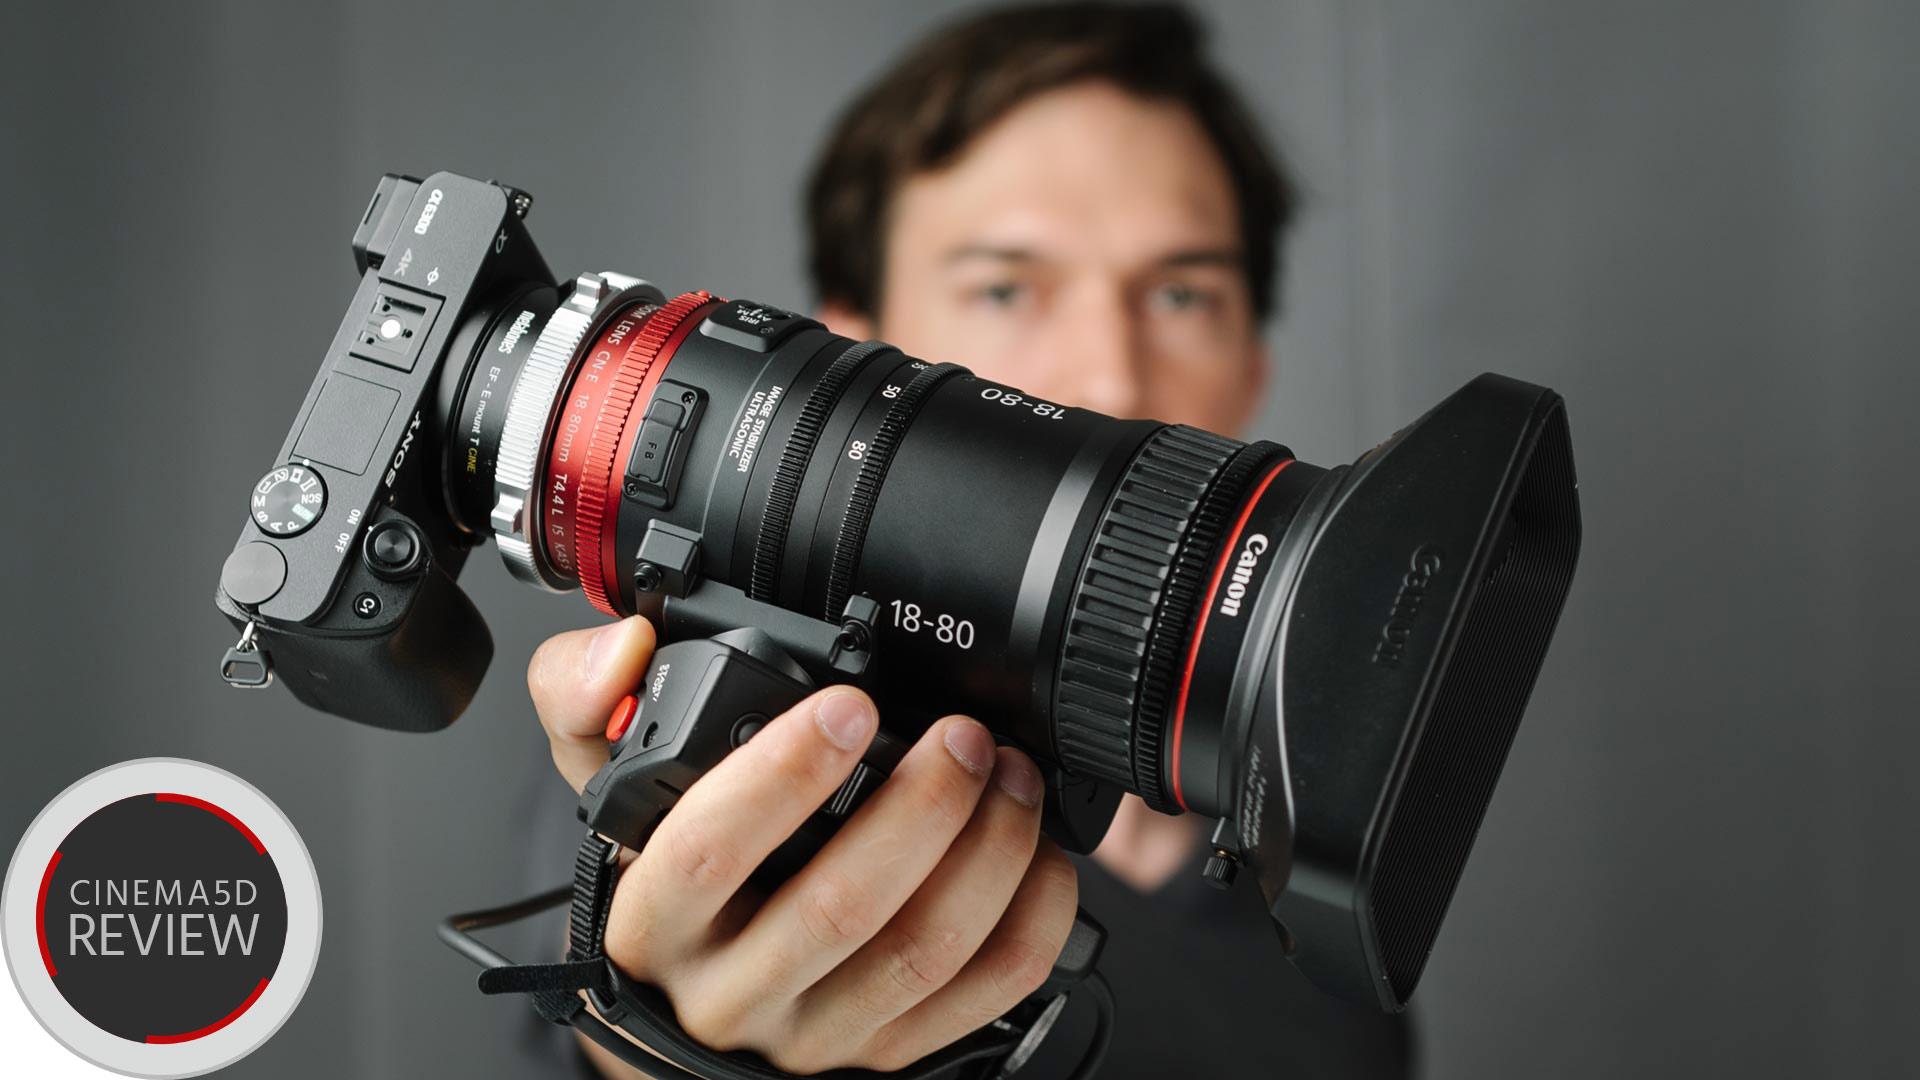 "Reseña Canon 18-80mm T4.4 - Probando el lente servo ""Cine"" de Canon"